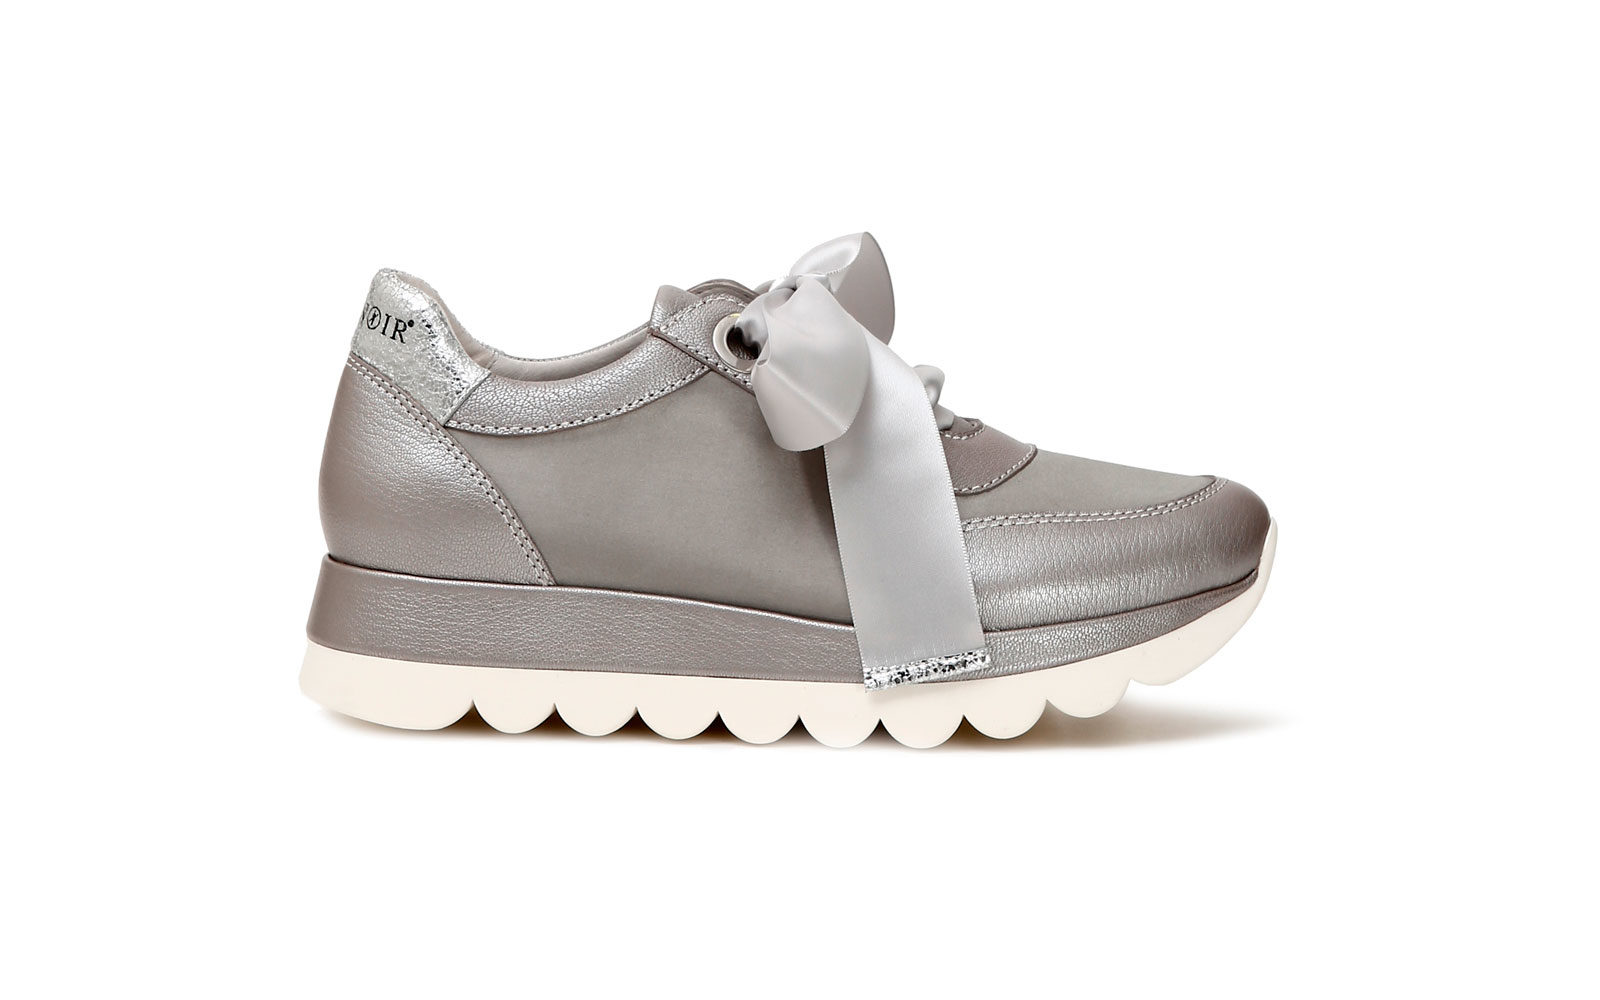 CafèNoir Sneakers in pelle perlata e raso euro 119